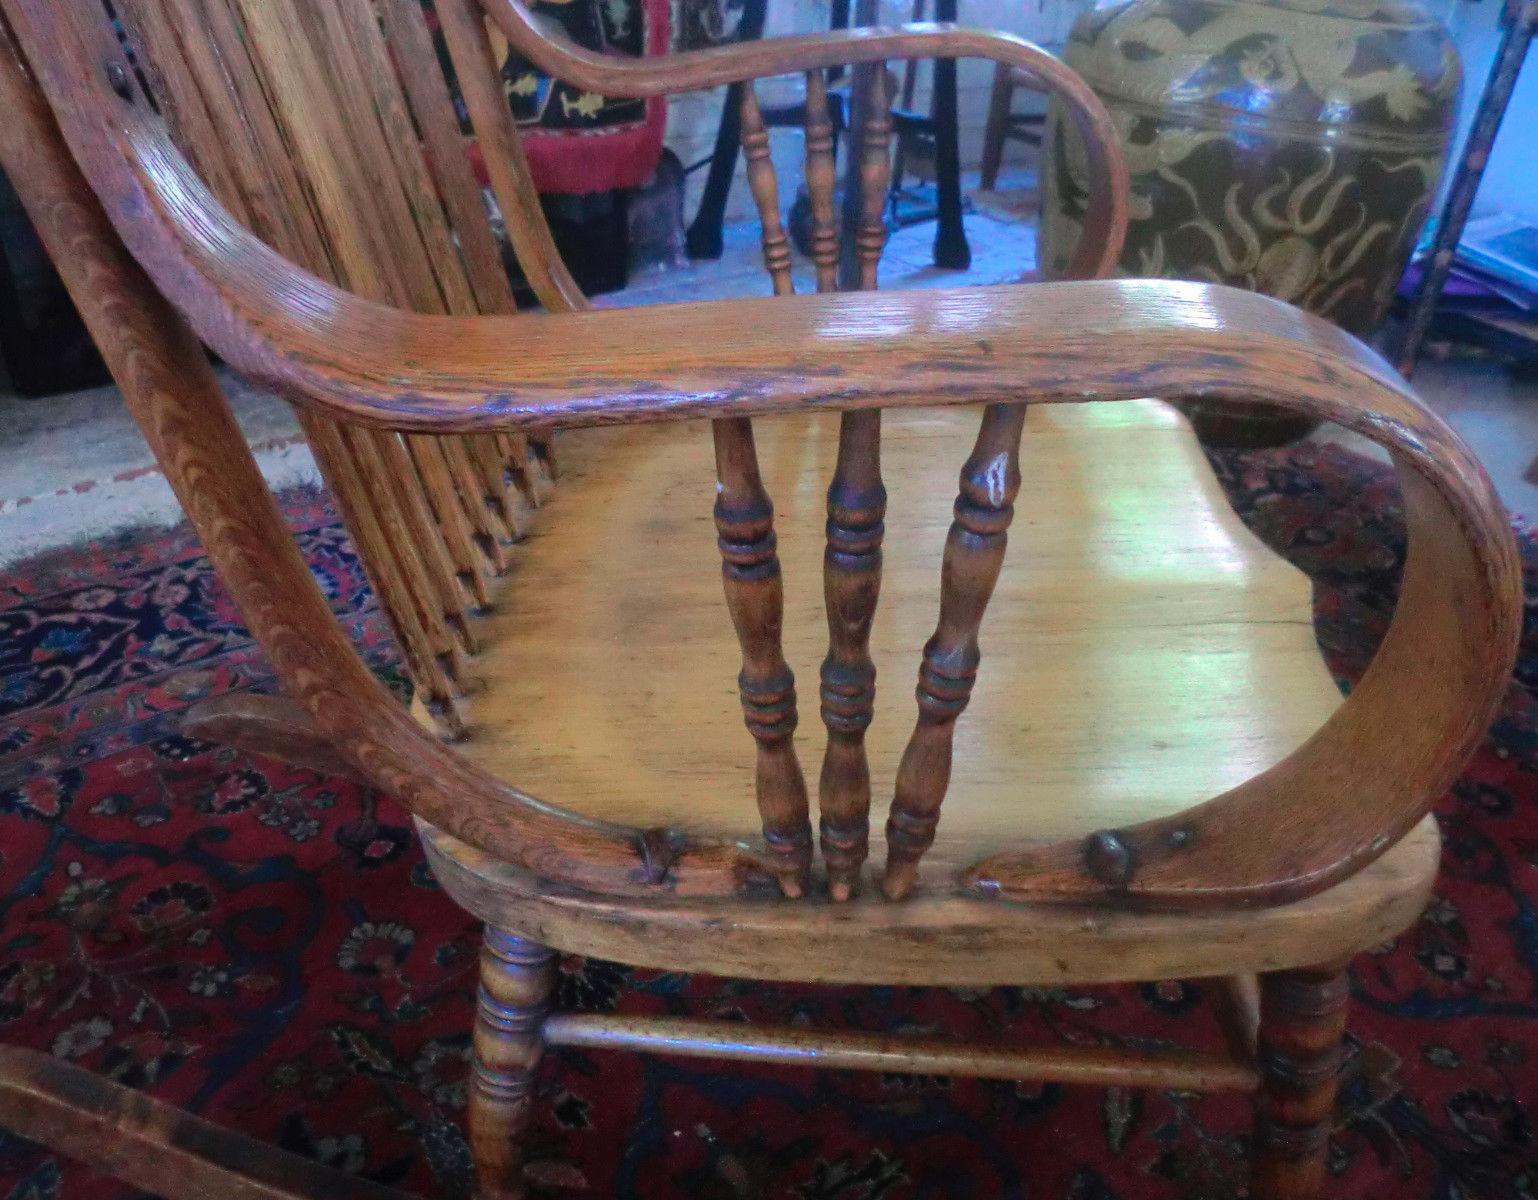 Antique Oak Bentwood Rocker Rocking Chair And Similar Items - Antique bentwood rocker rocking chair